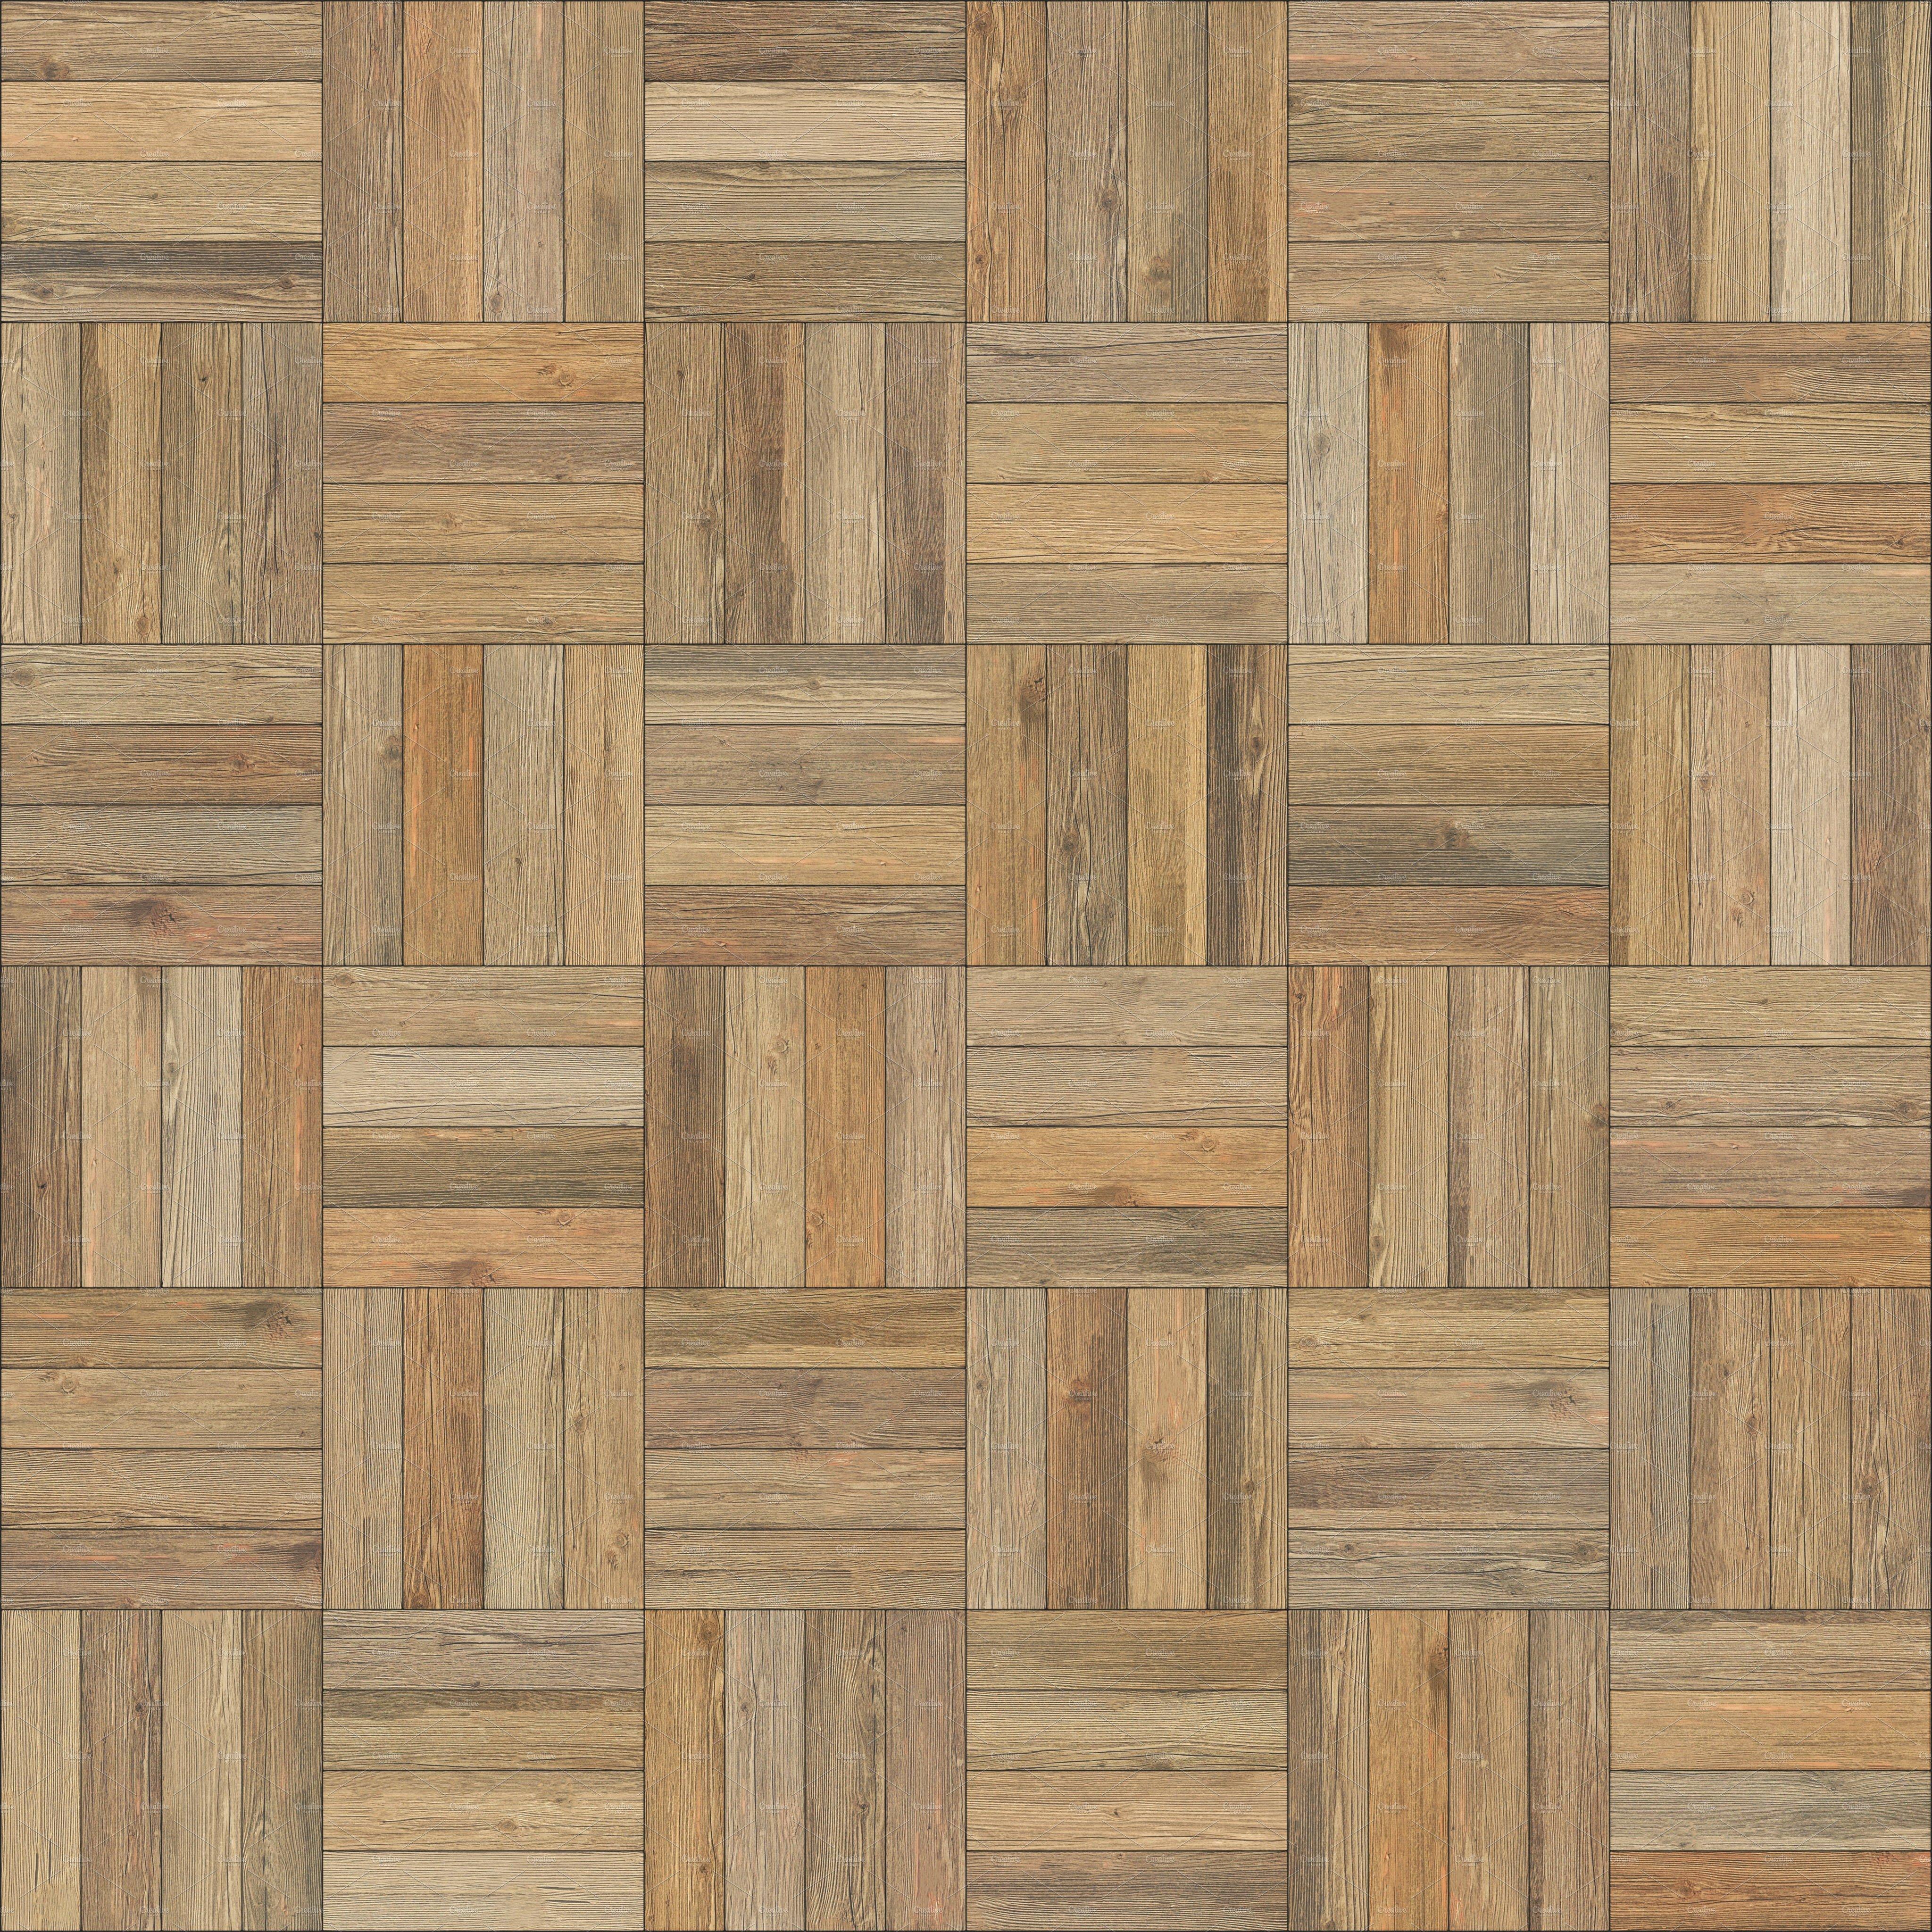 bq floor oak departments staccato parquet at m flooring b prd q diy laminate pack effect